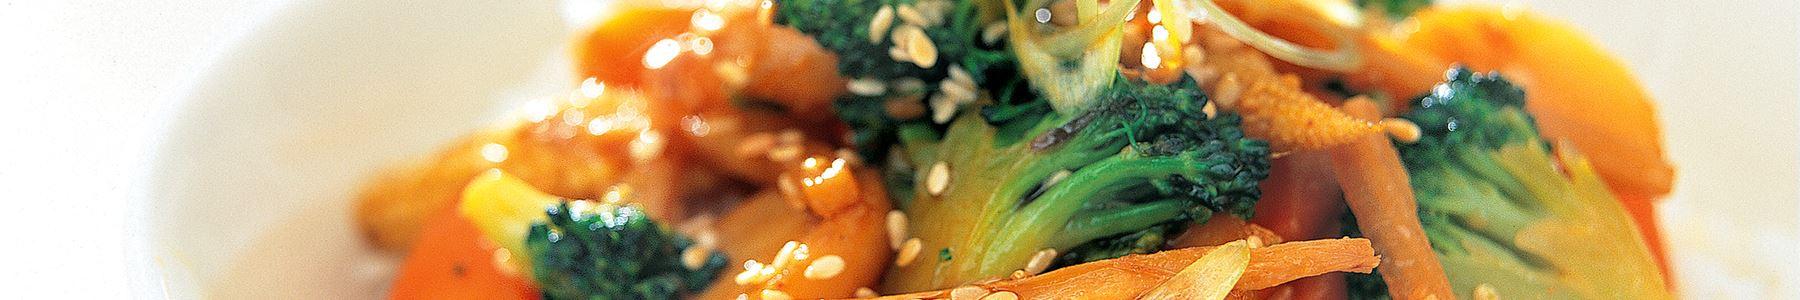 Vegetarisk wok